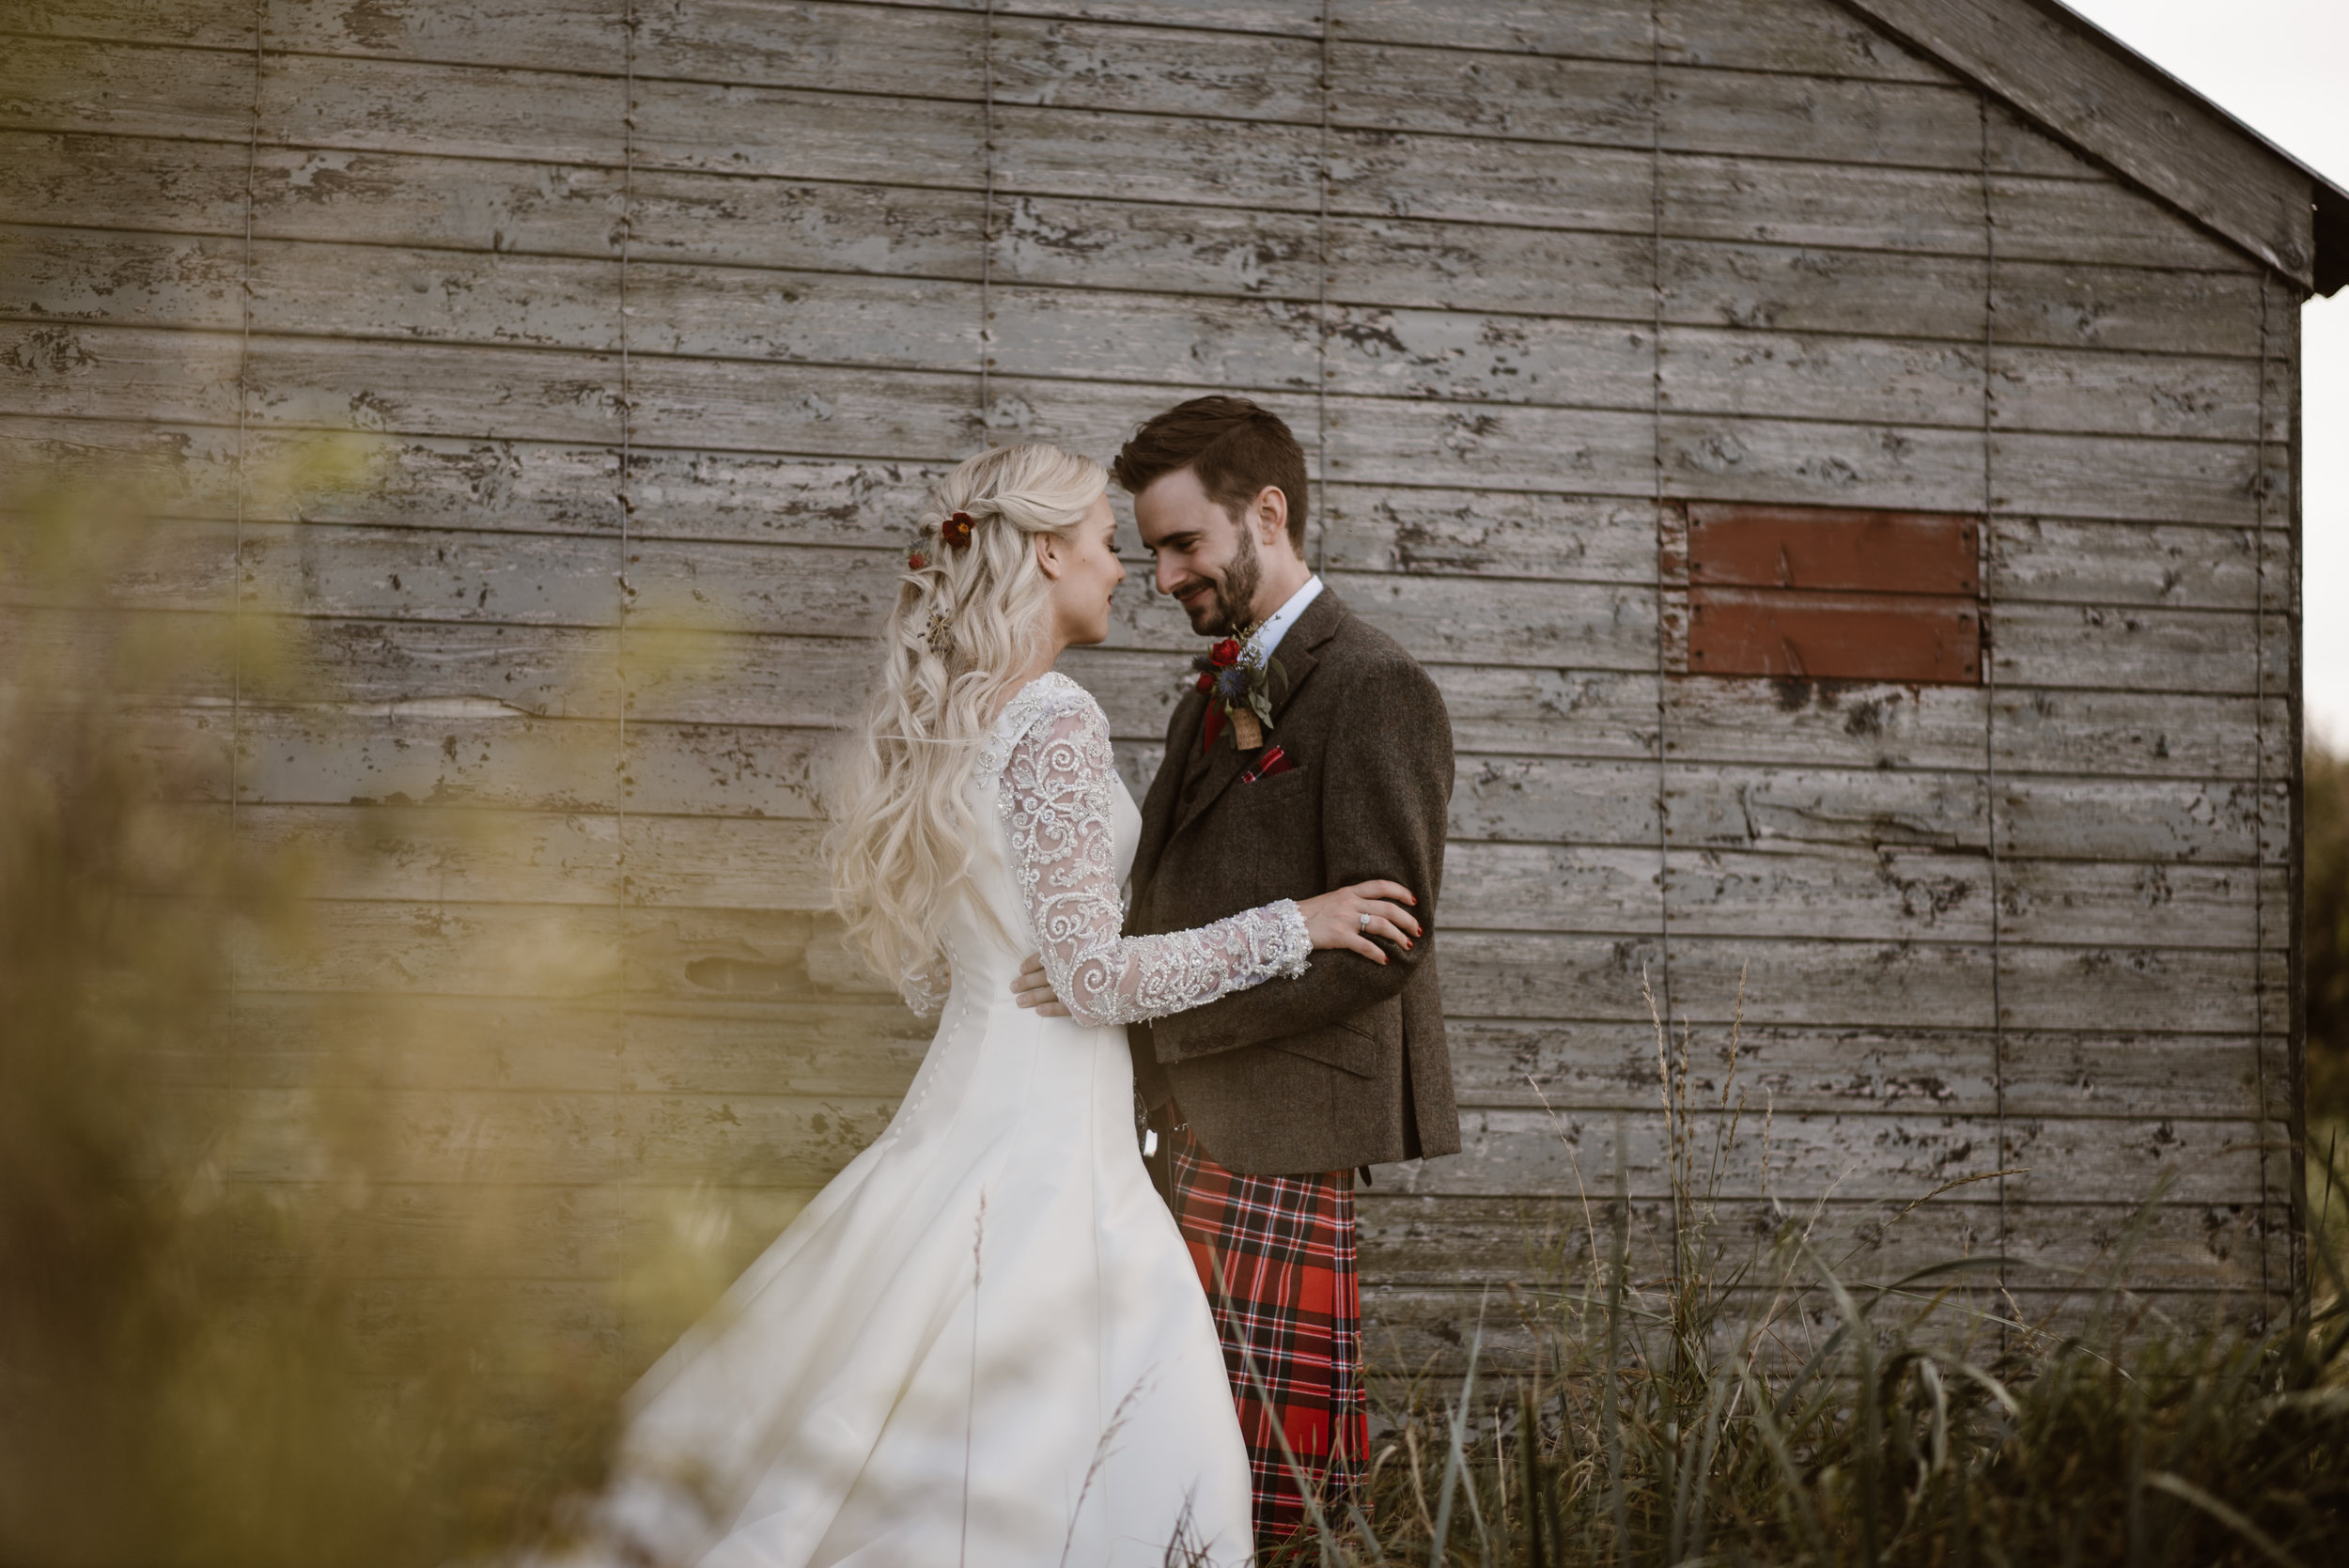 KInkell Byre Wedding0498 2.jpg